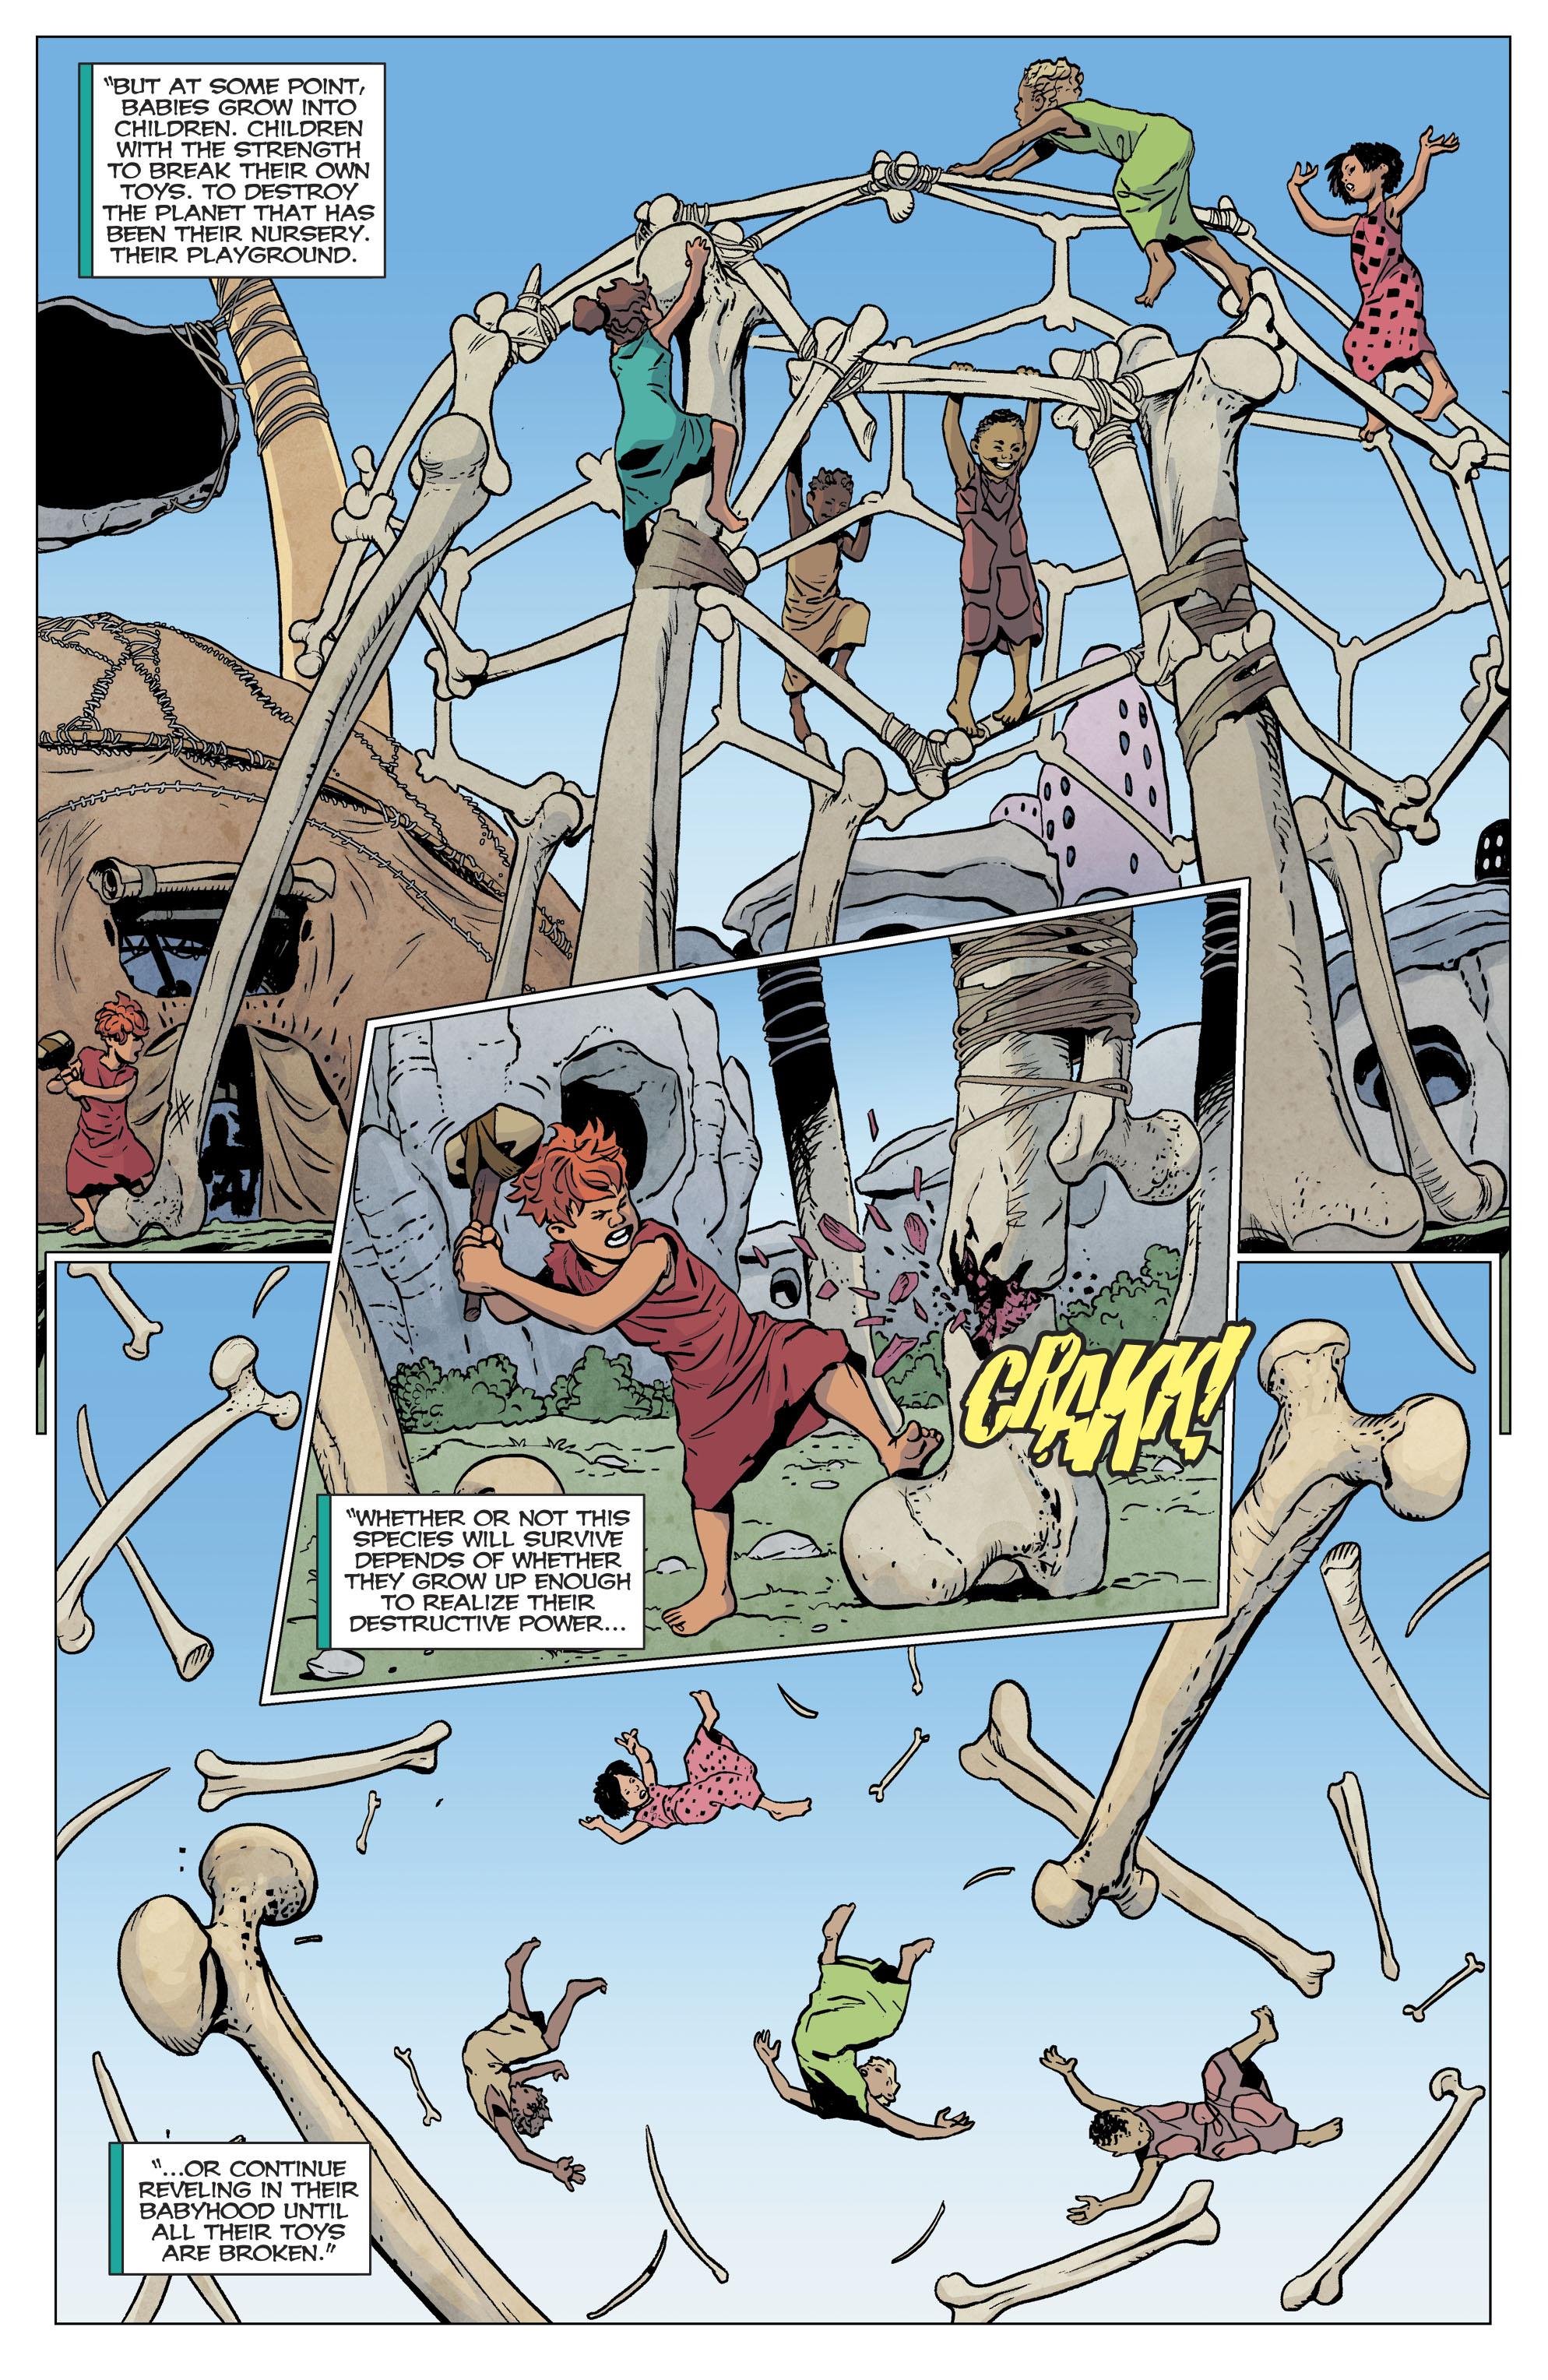 Read online The Flintstones comic -  Issue #12 - 6